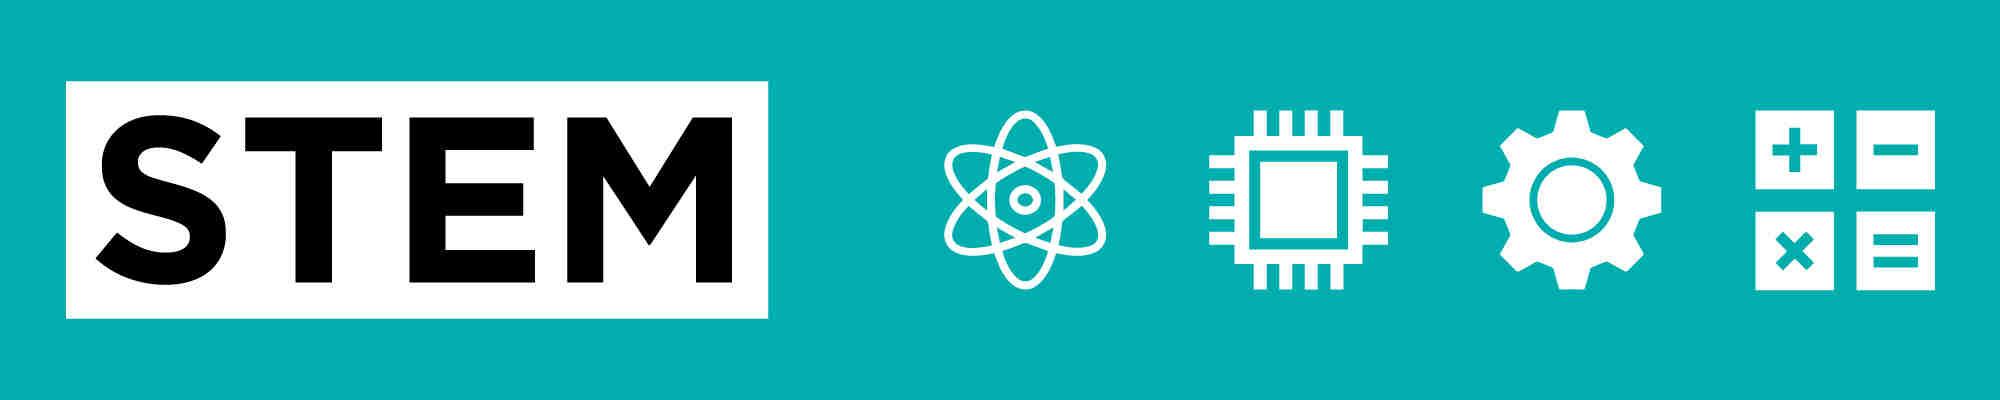 STEM: science, technology, engineering, mathematics